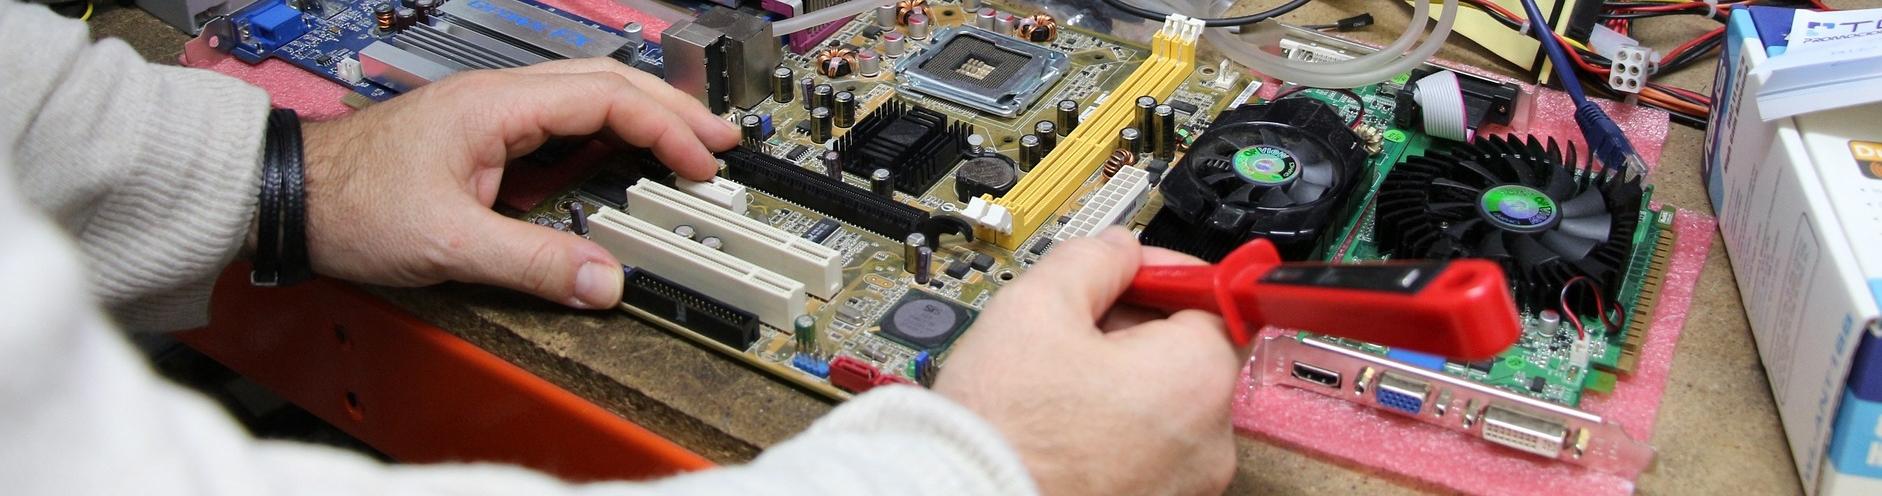 Computer Repair Astoria NY - Workbench